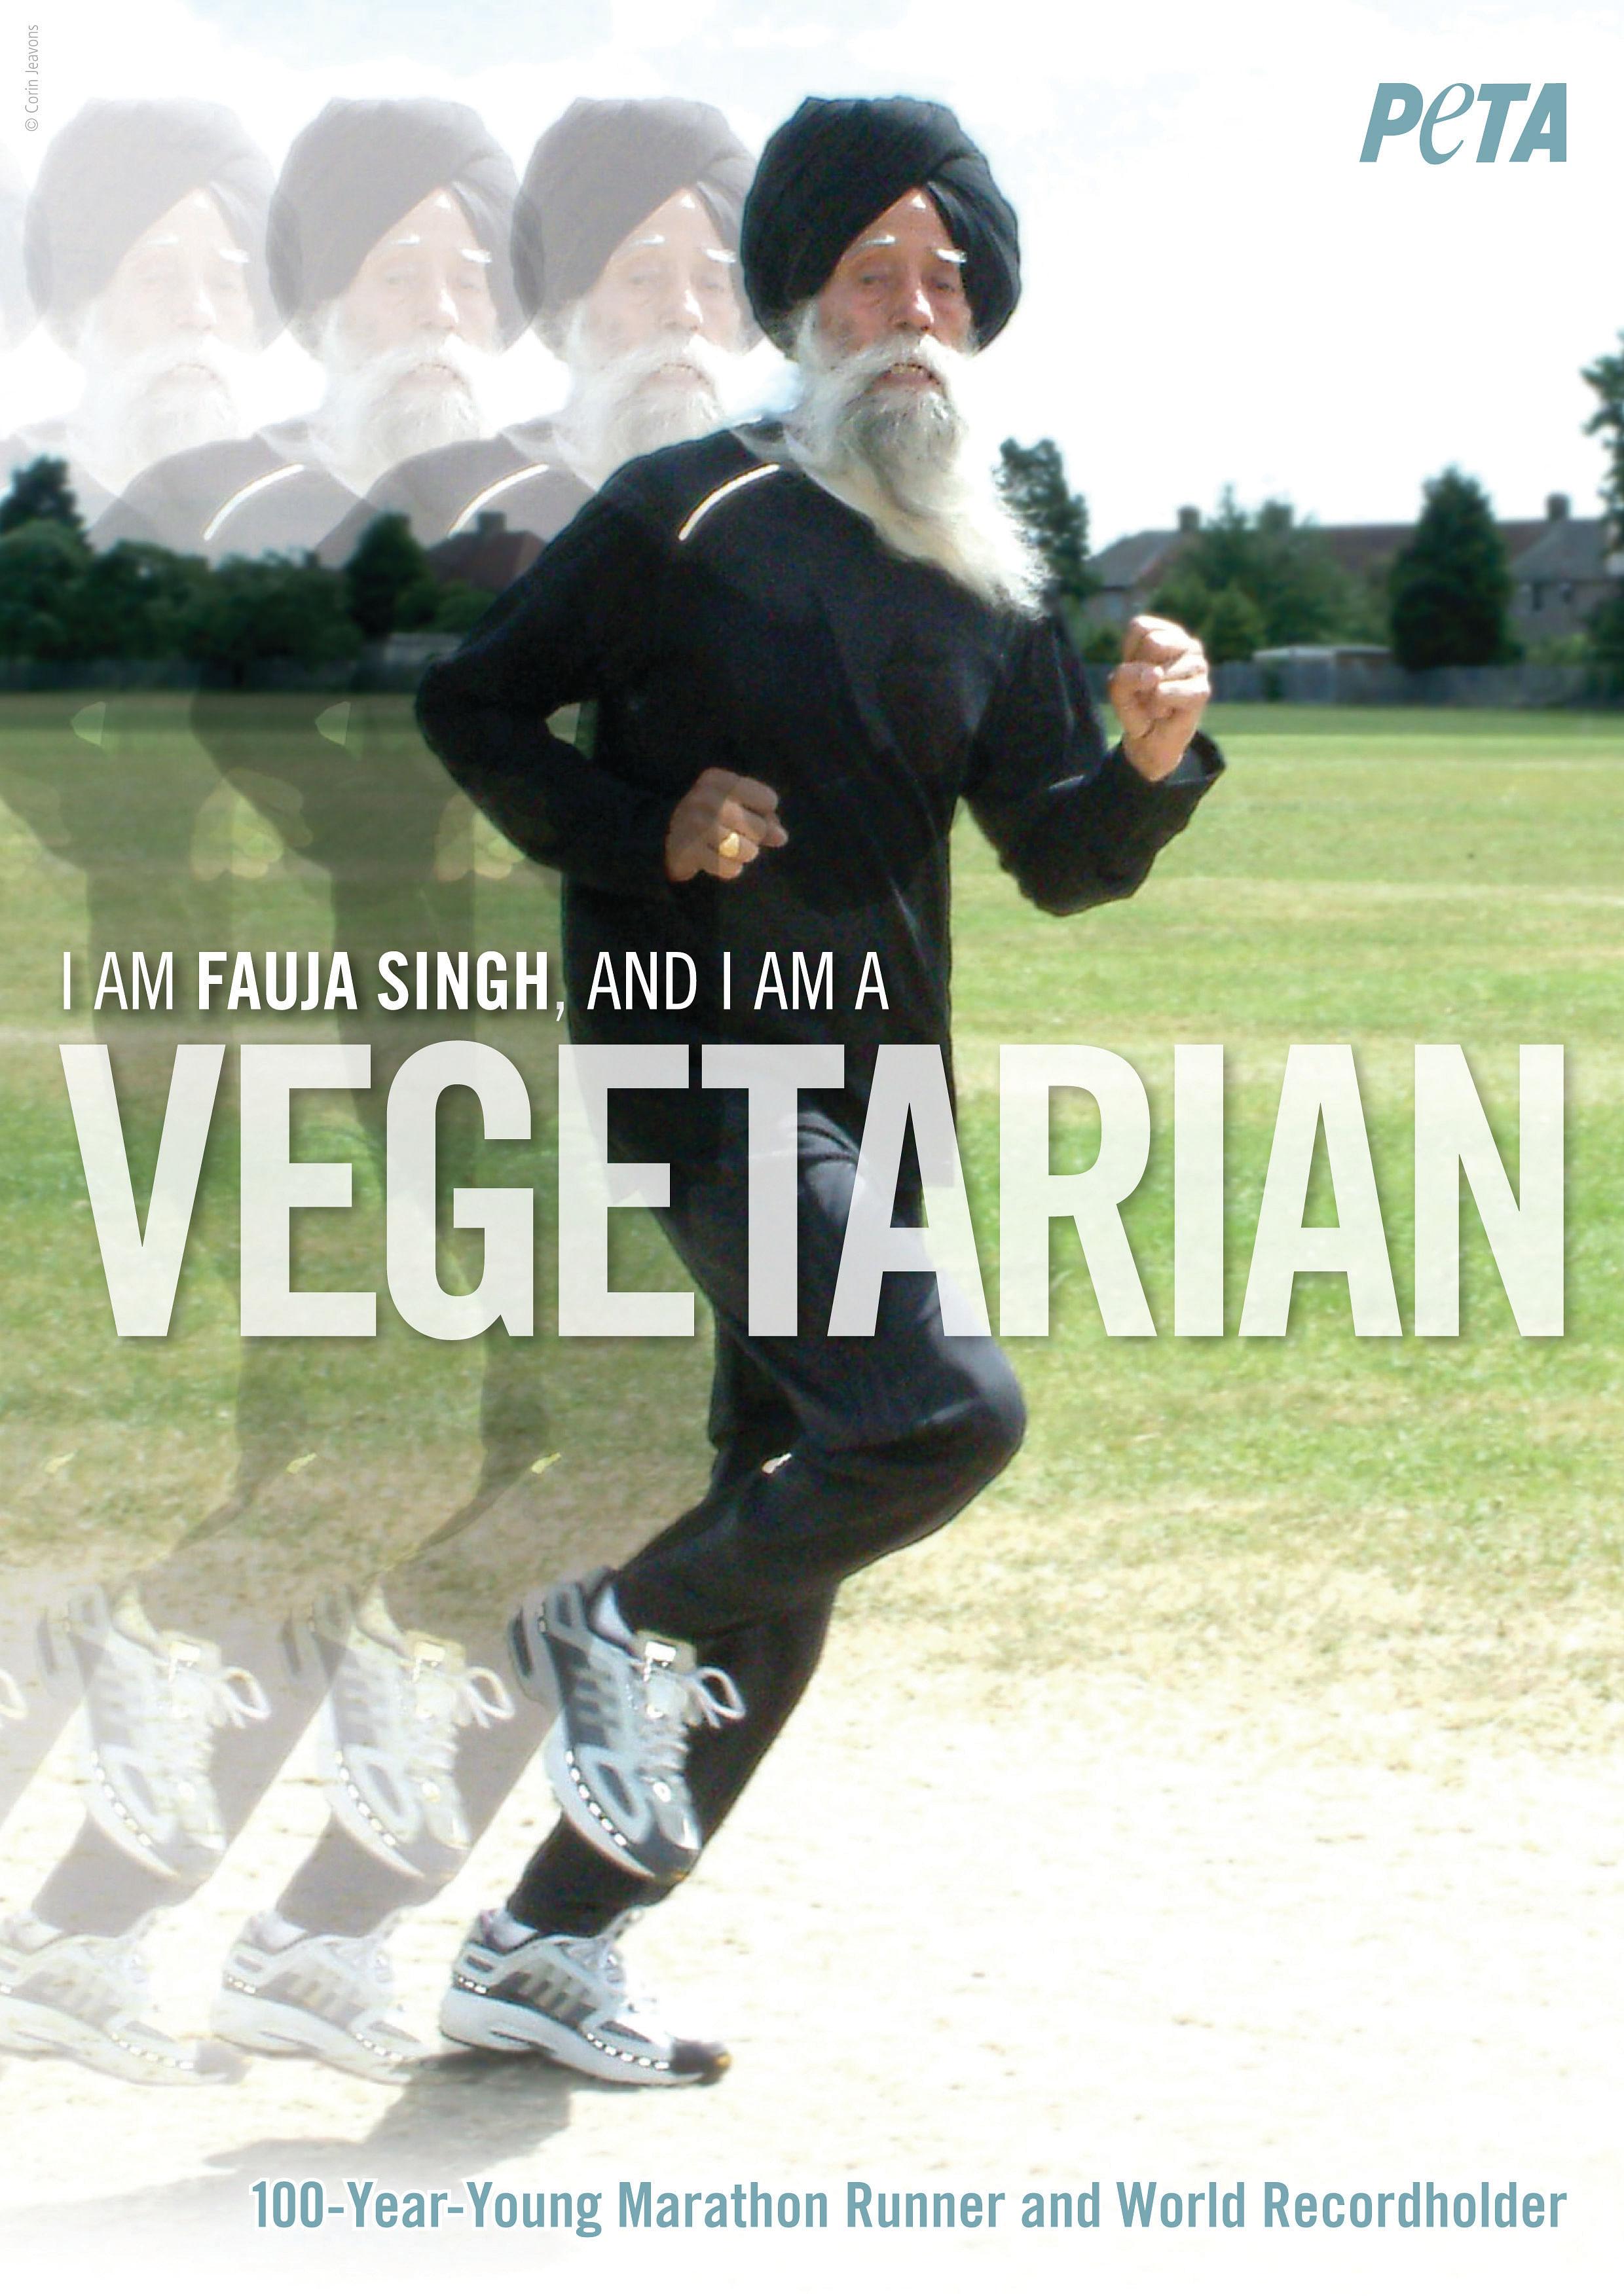 I-am-Fauja-Singh-and-I-am-a-Vegetarian PETA AD